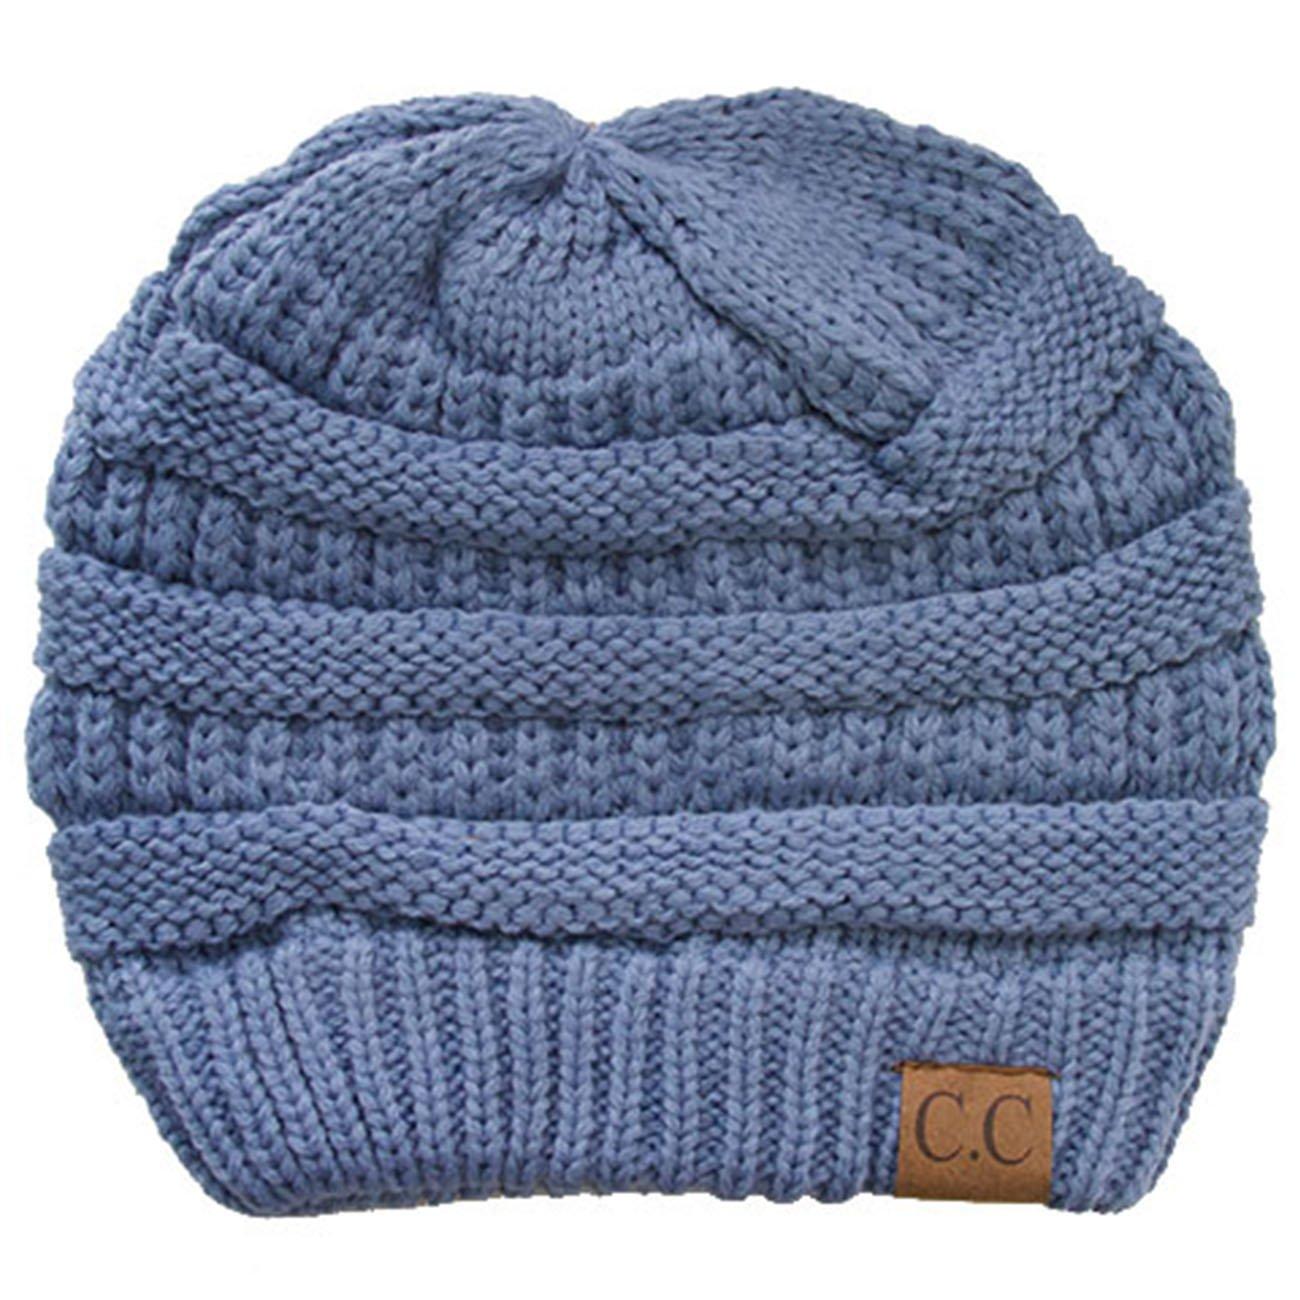 ScarvesMe CC 3pc Set Trendy Warm Chunky Soft Stretch Cable Knit Beanie Scarves Gloves Set (Denim) by ScarvesMe (Image #2)